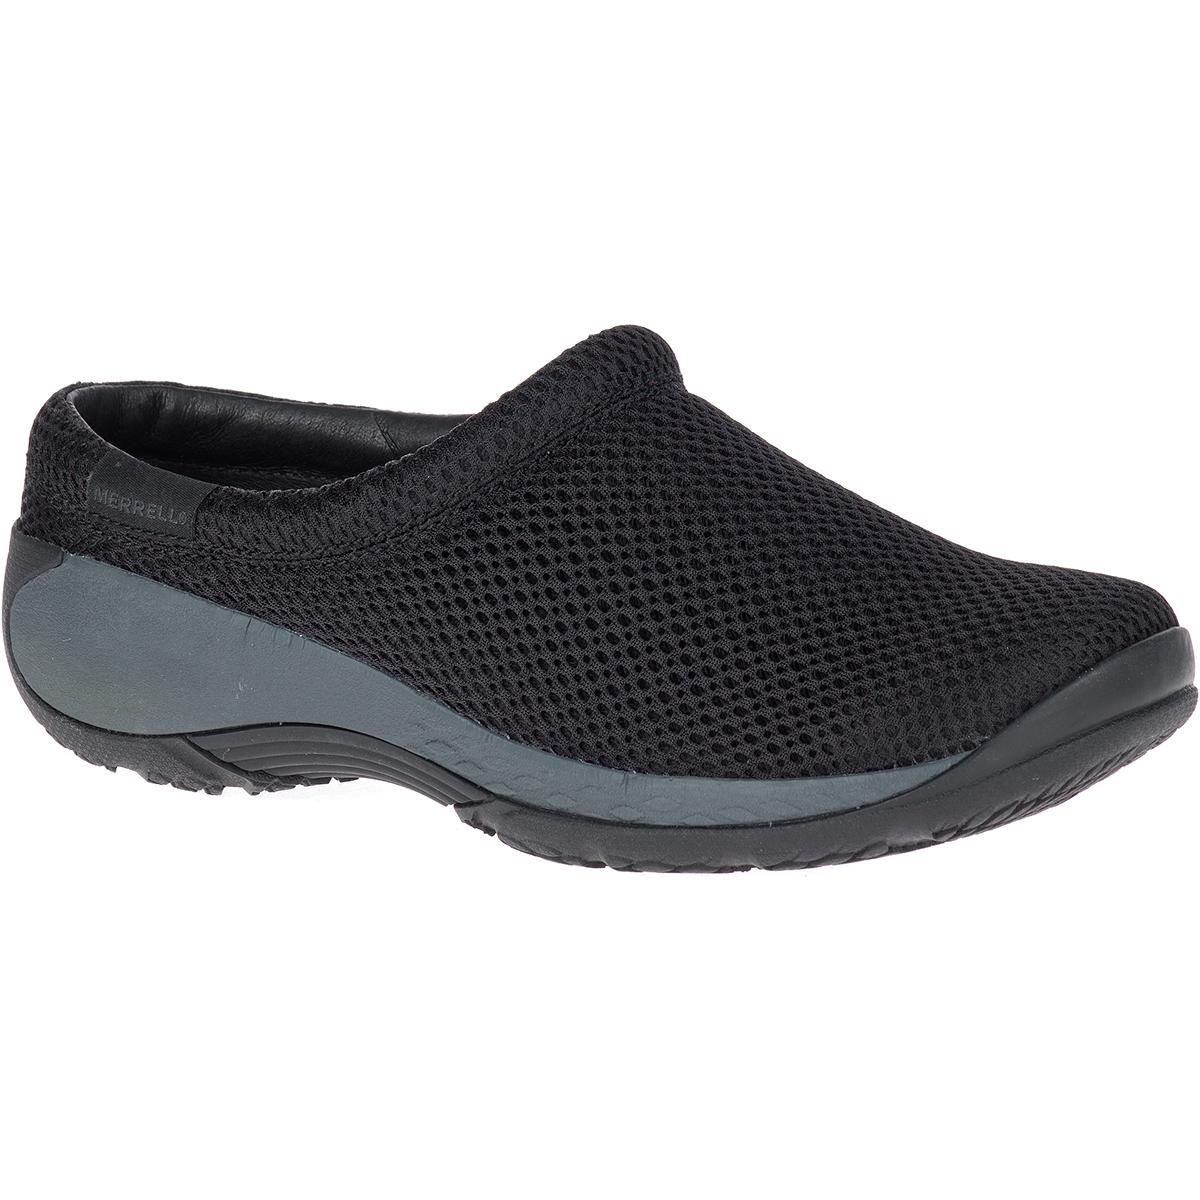 Merrell Women's Encore Q2 Breeze Slip-On Casual Shoes - Black, 7